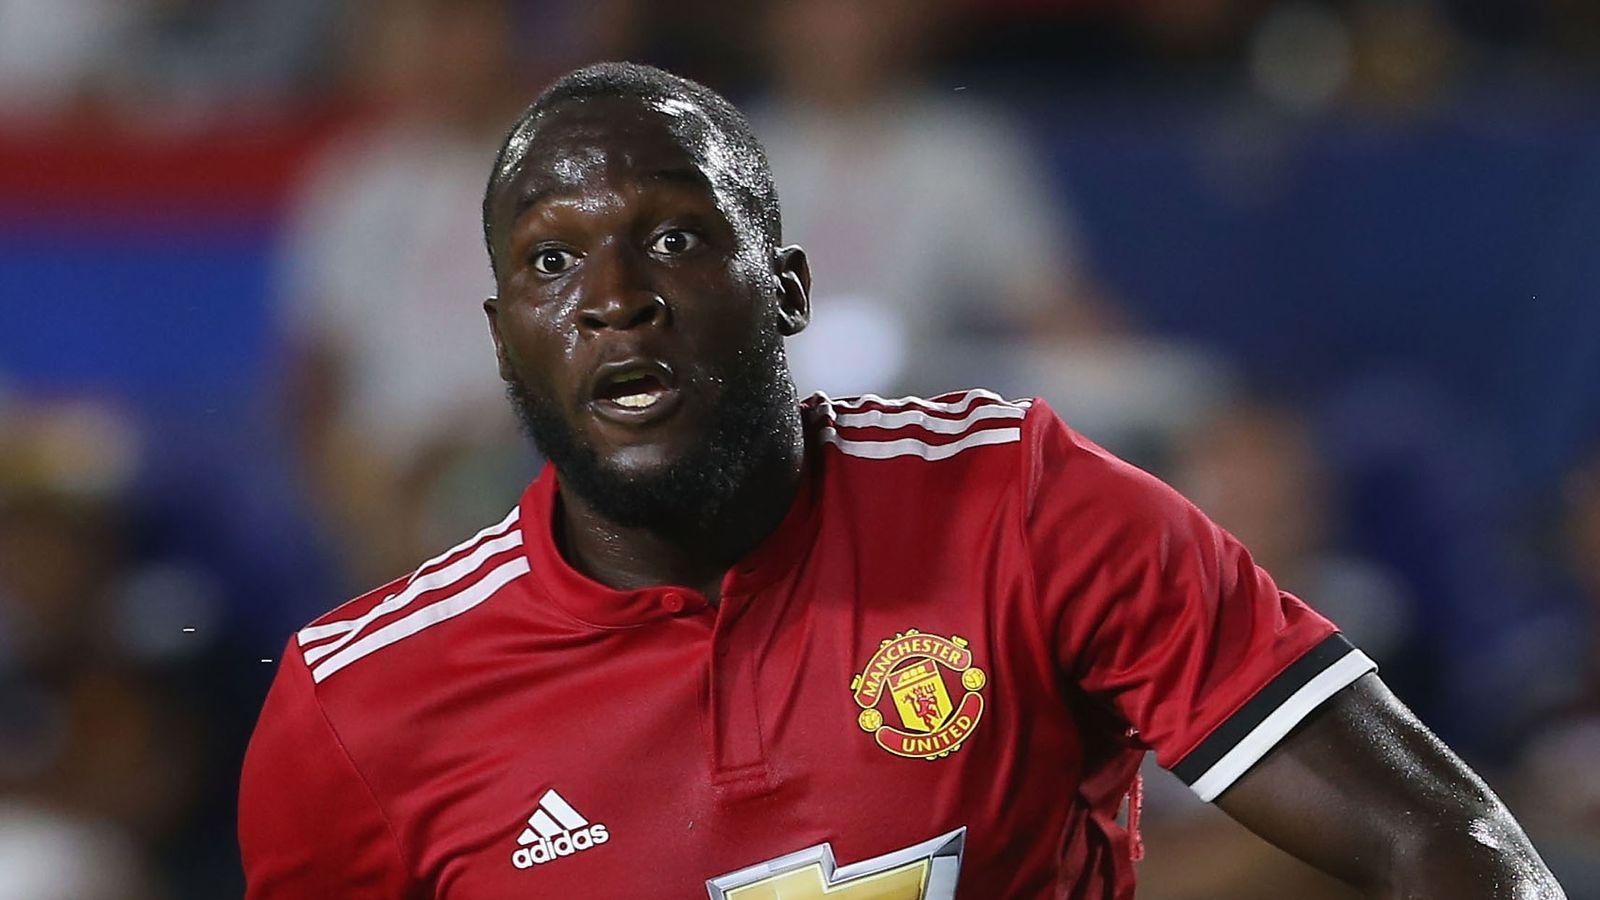 Manchester United seek advice on racist Romelu Lukaku chant